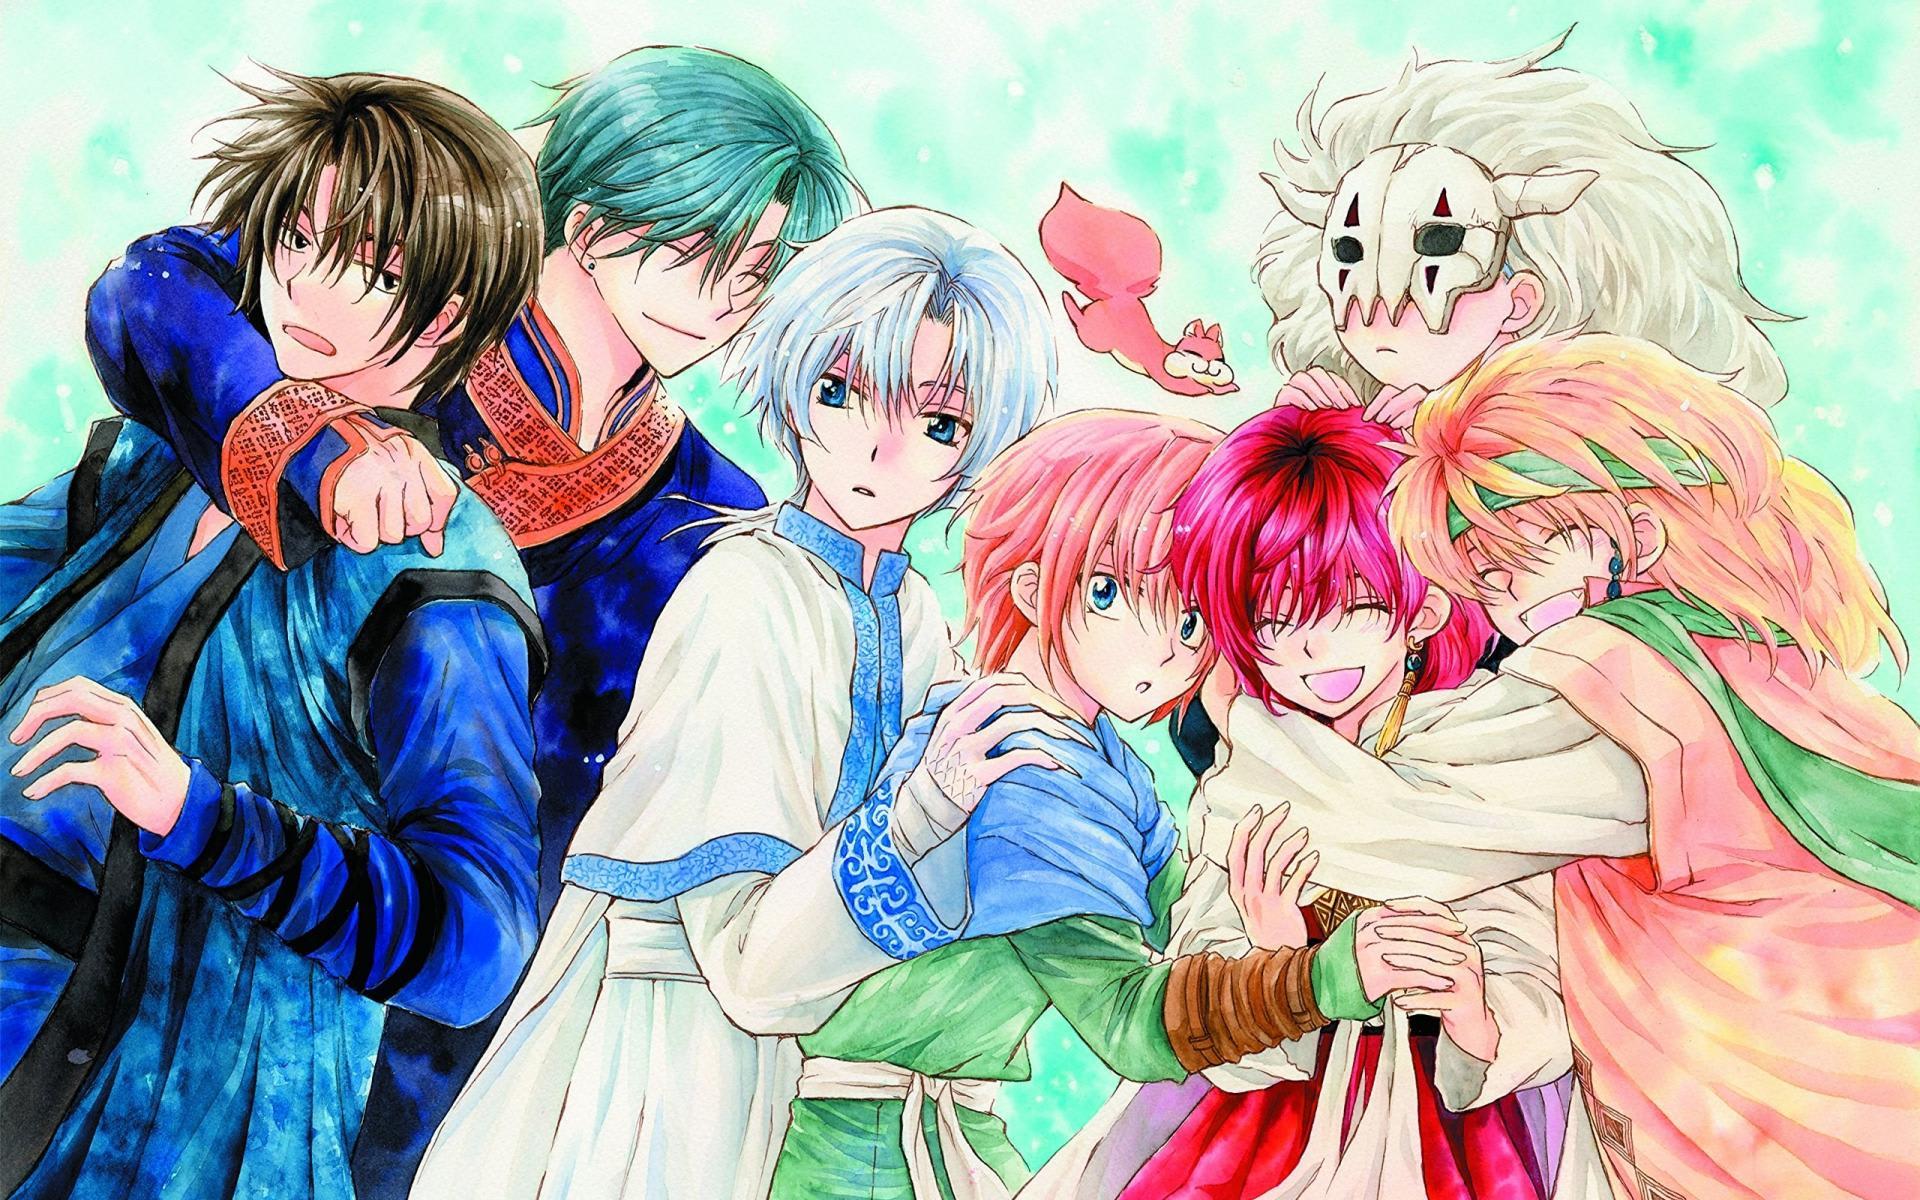 Ten Of The Best Romance Manga To Date